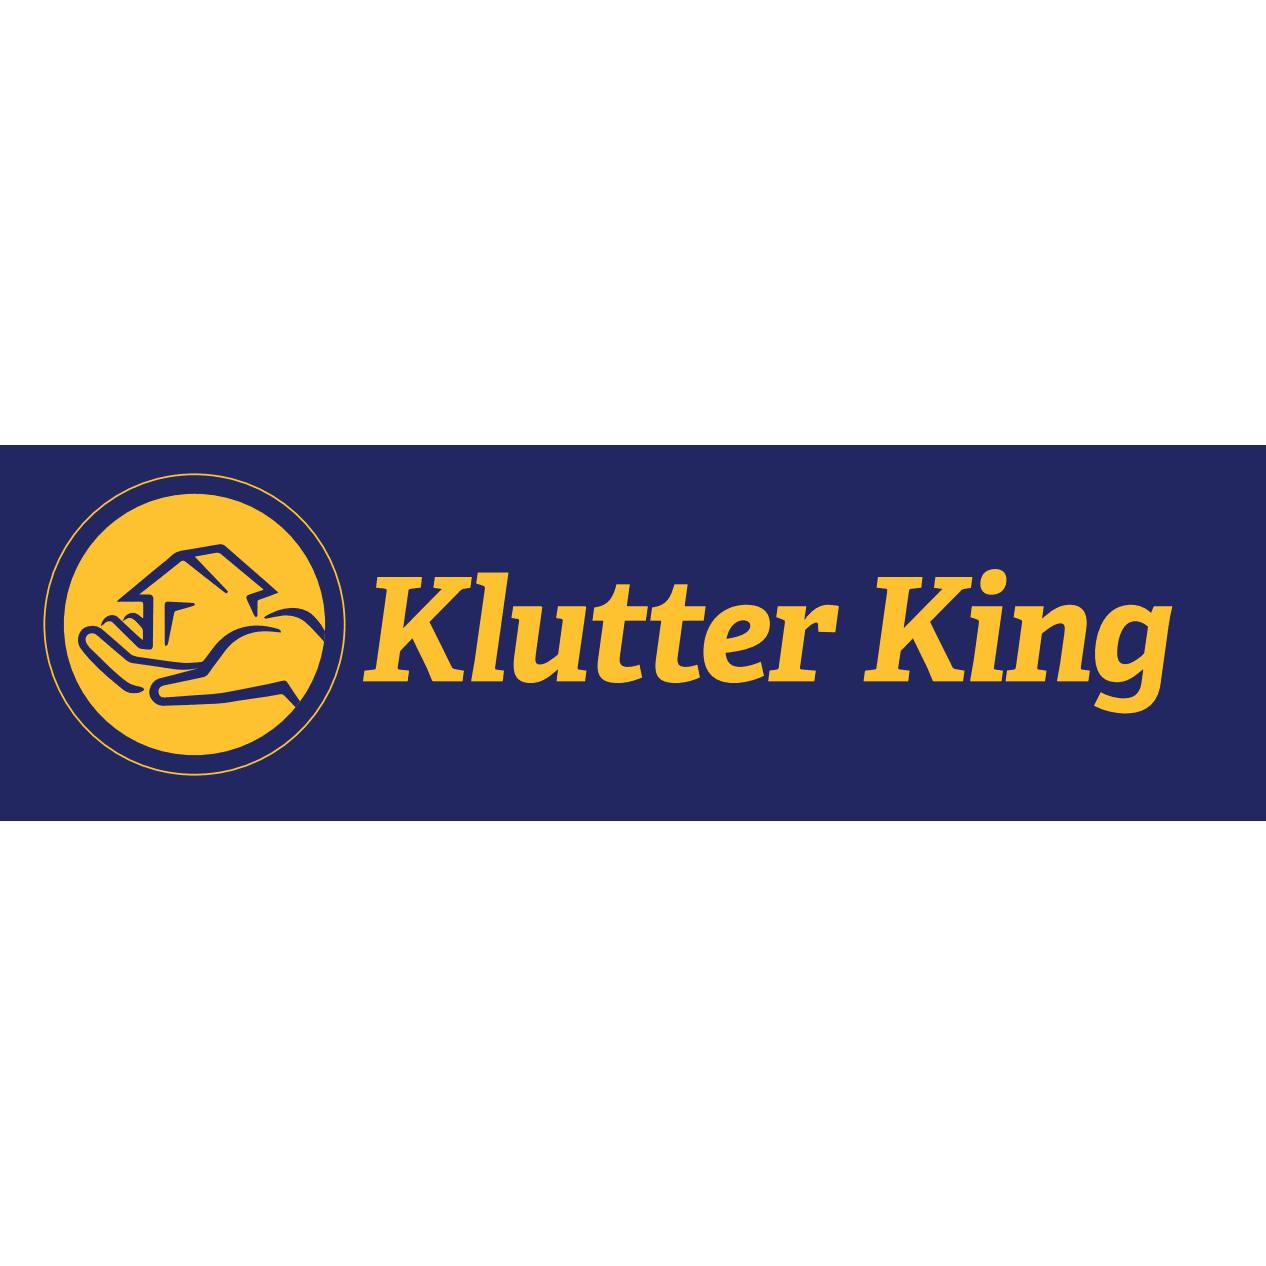 Klutter King - Tonbridge, Kent TN12 5NF - 01622 815490 | ShowMeLocal.com